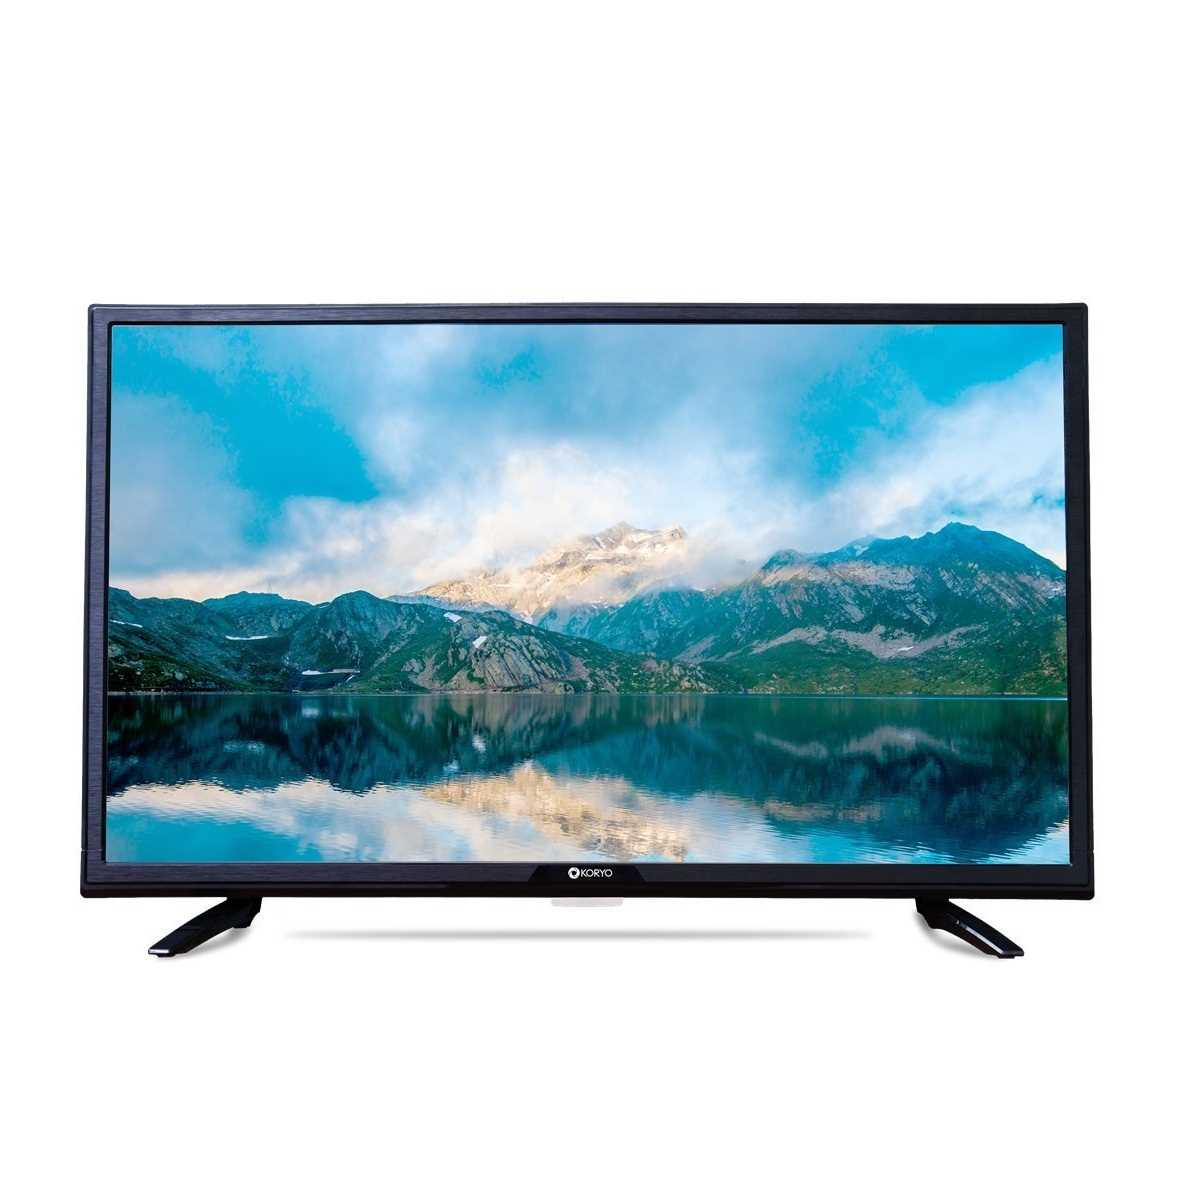 Koryo KLE32DLCHN7 32 Inch HD Ready LED Television